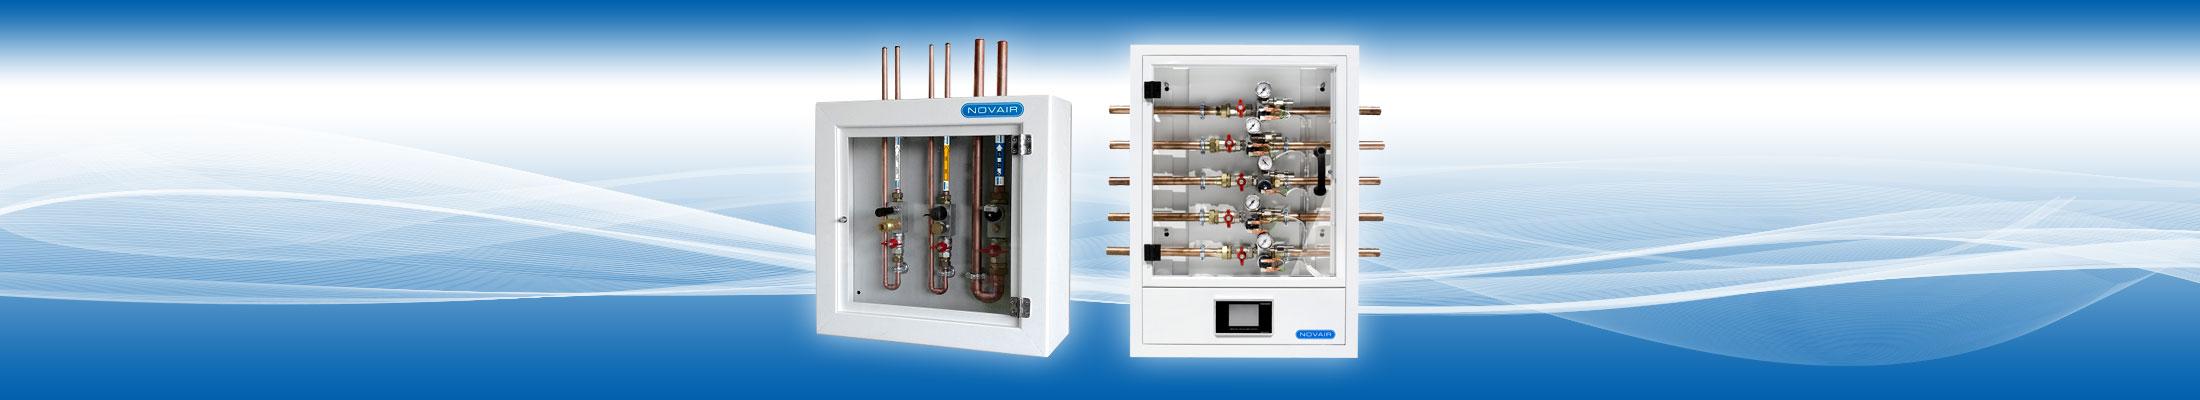 Area valves service units